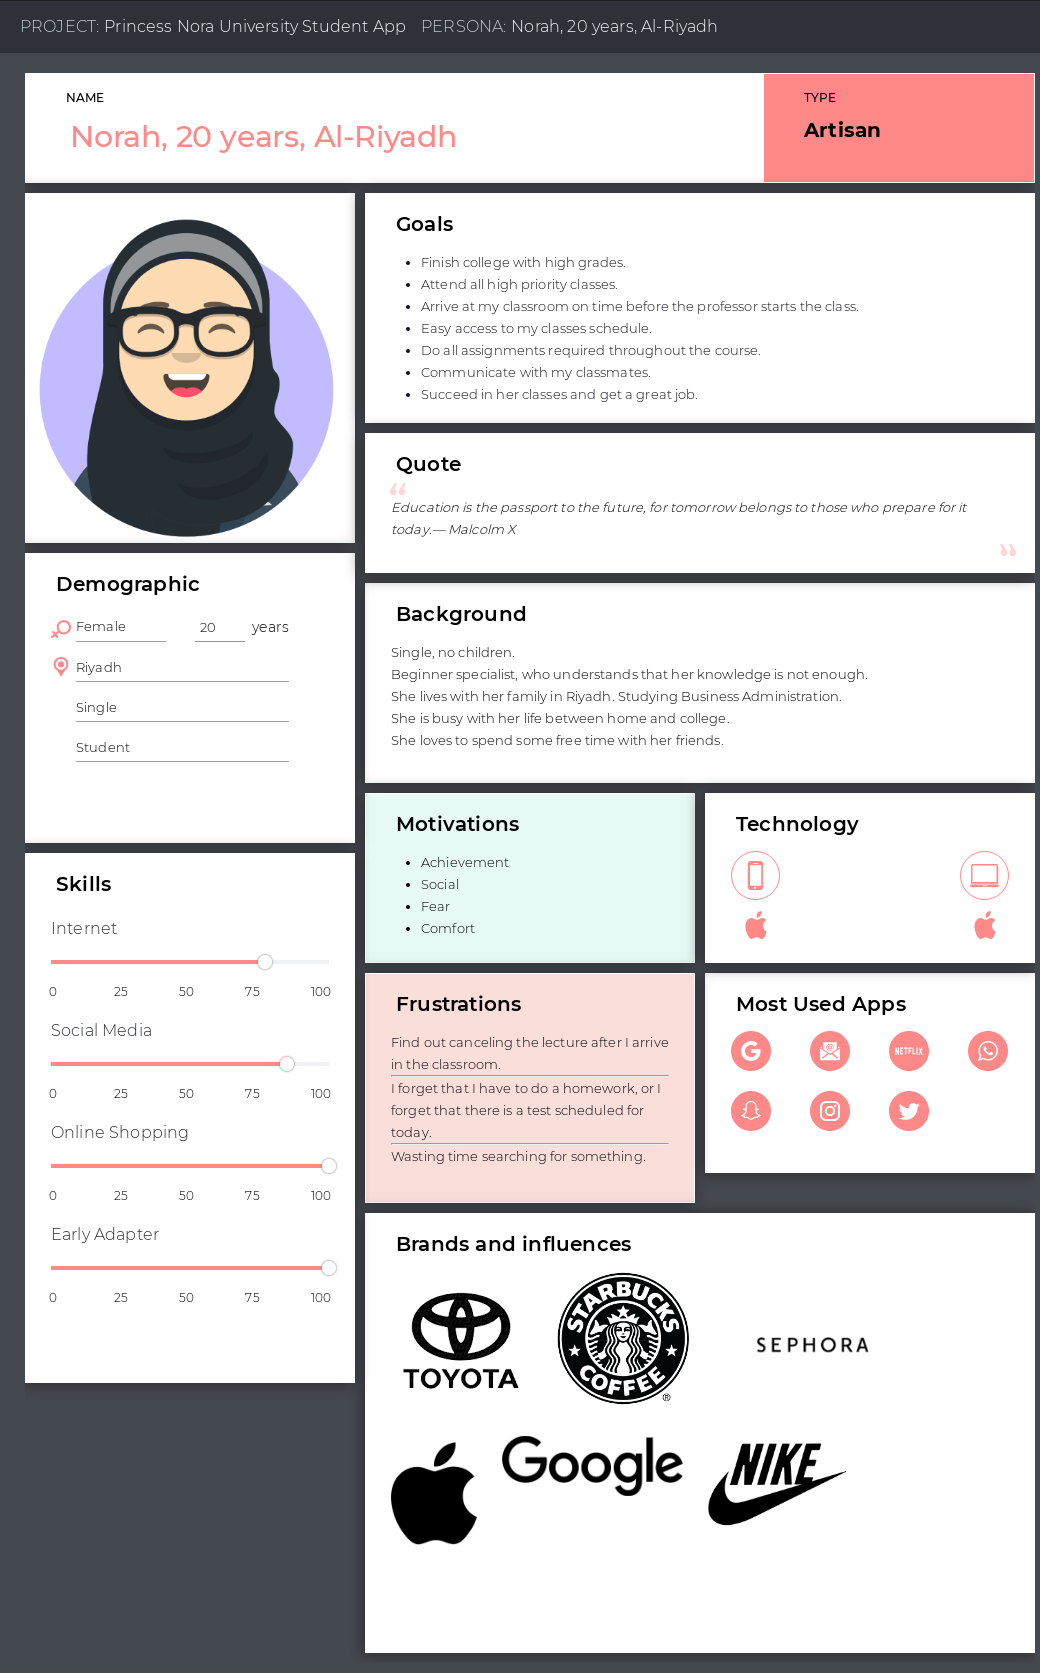 Nourah University Students App. - Student Persona